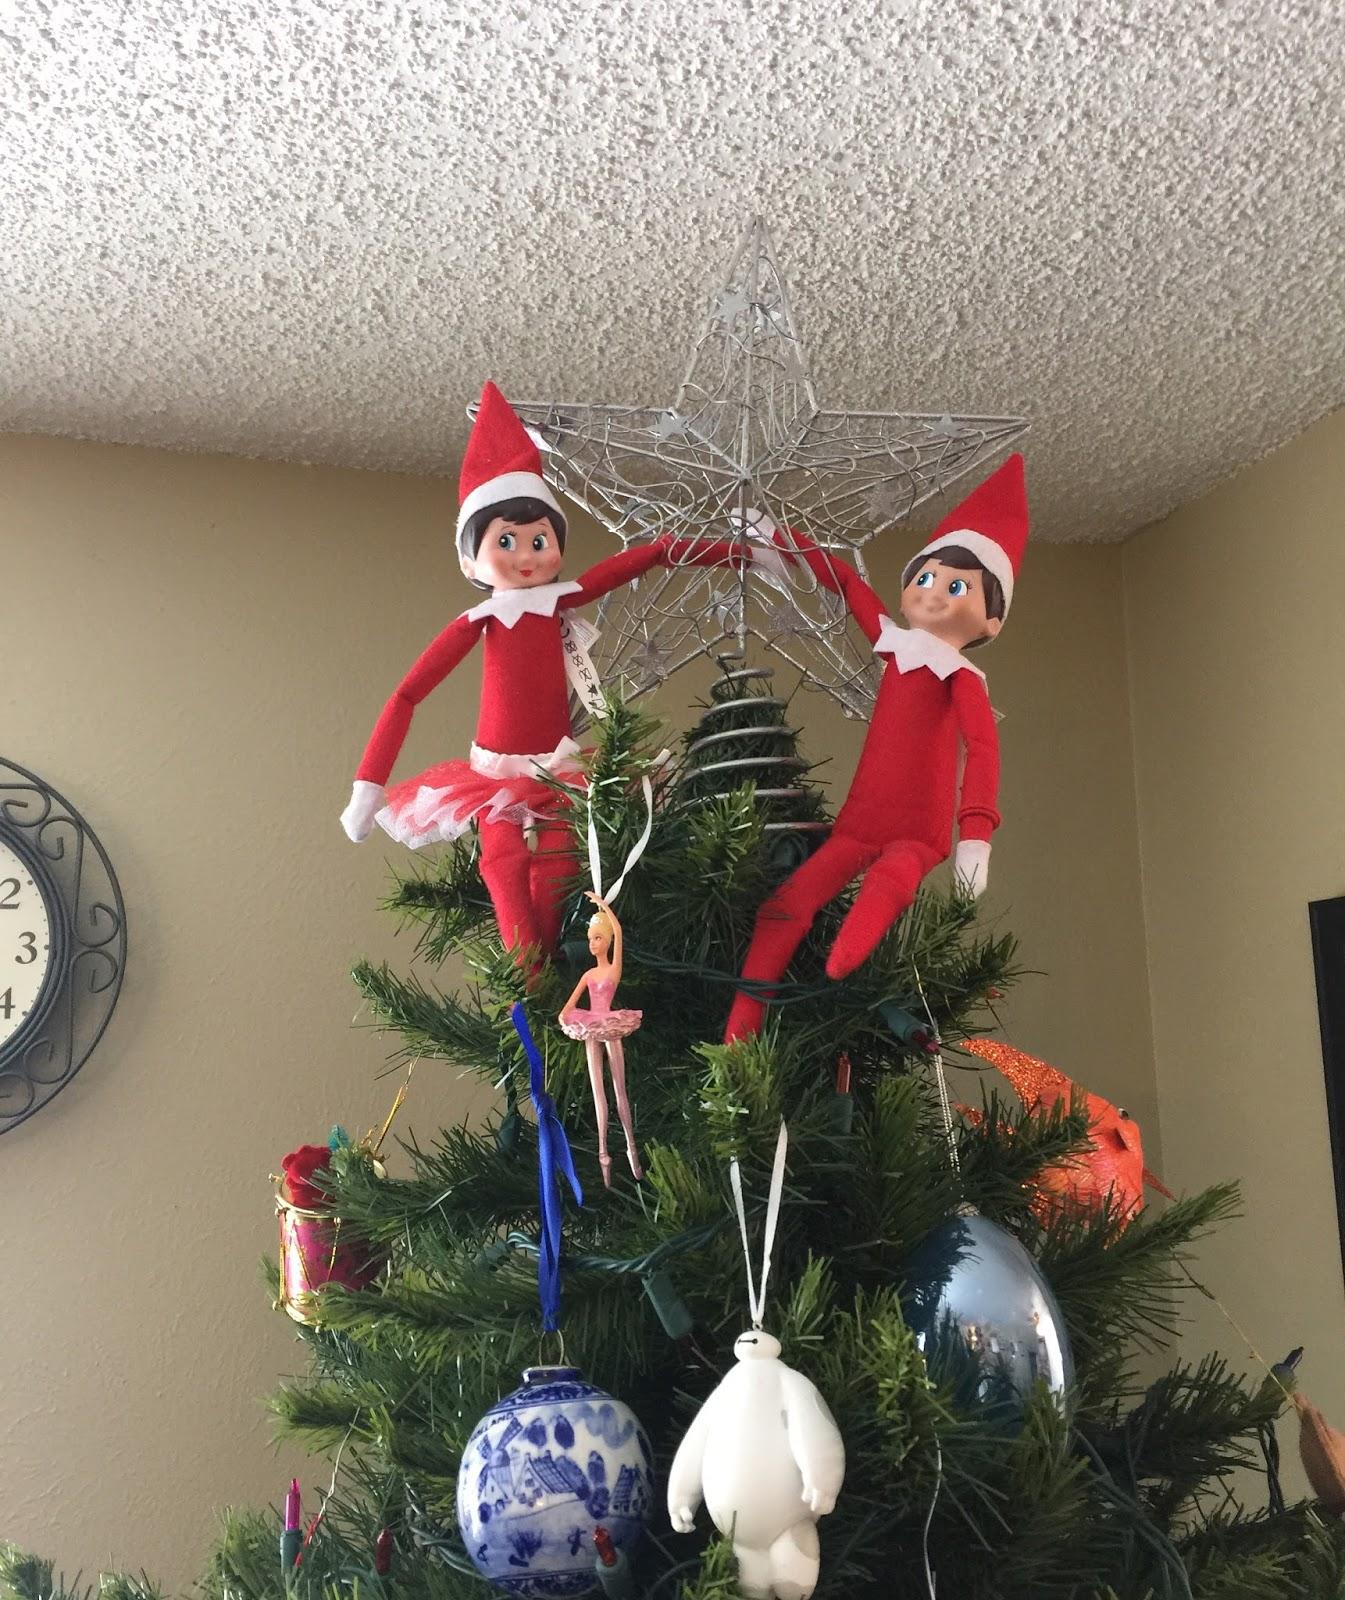 More Elf Pranks and Ideas